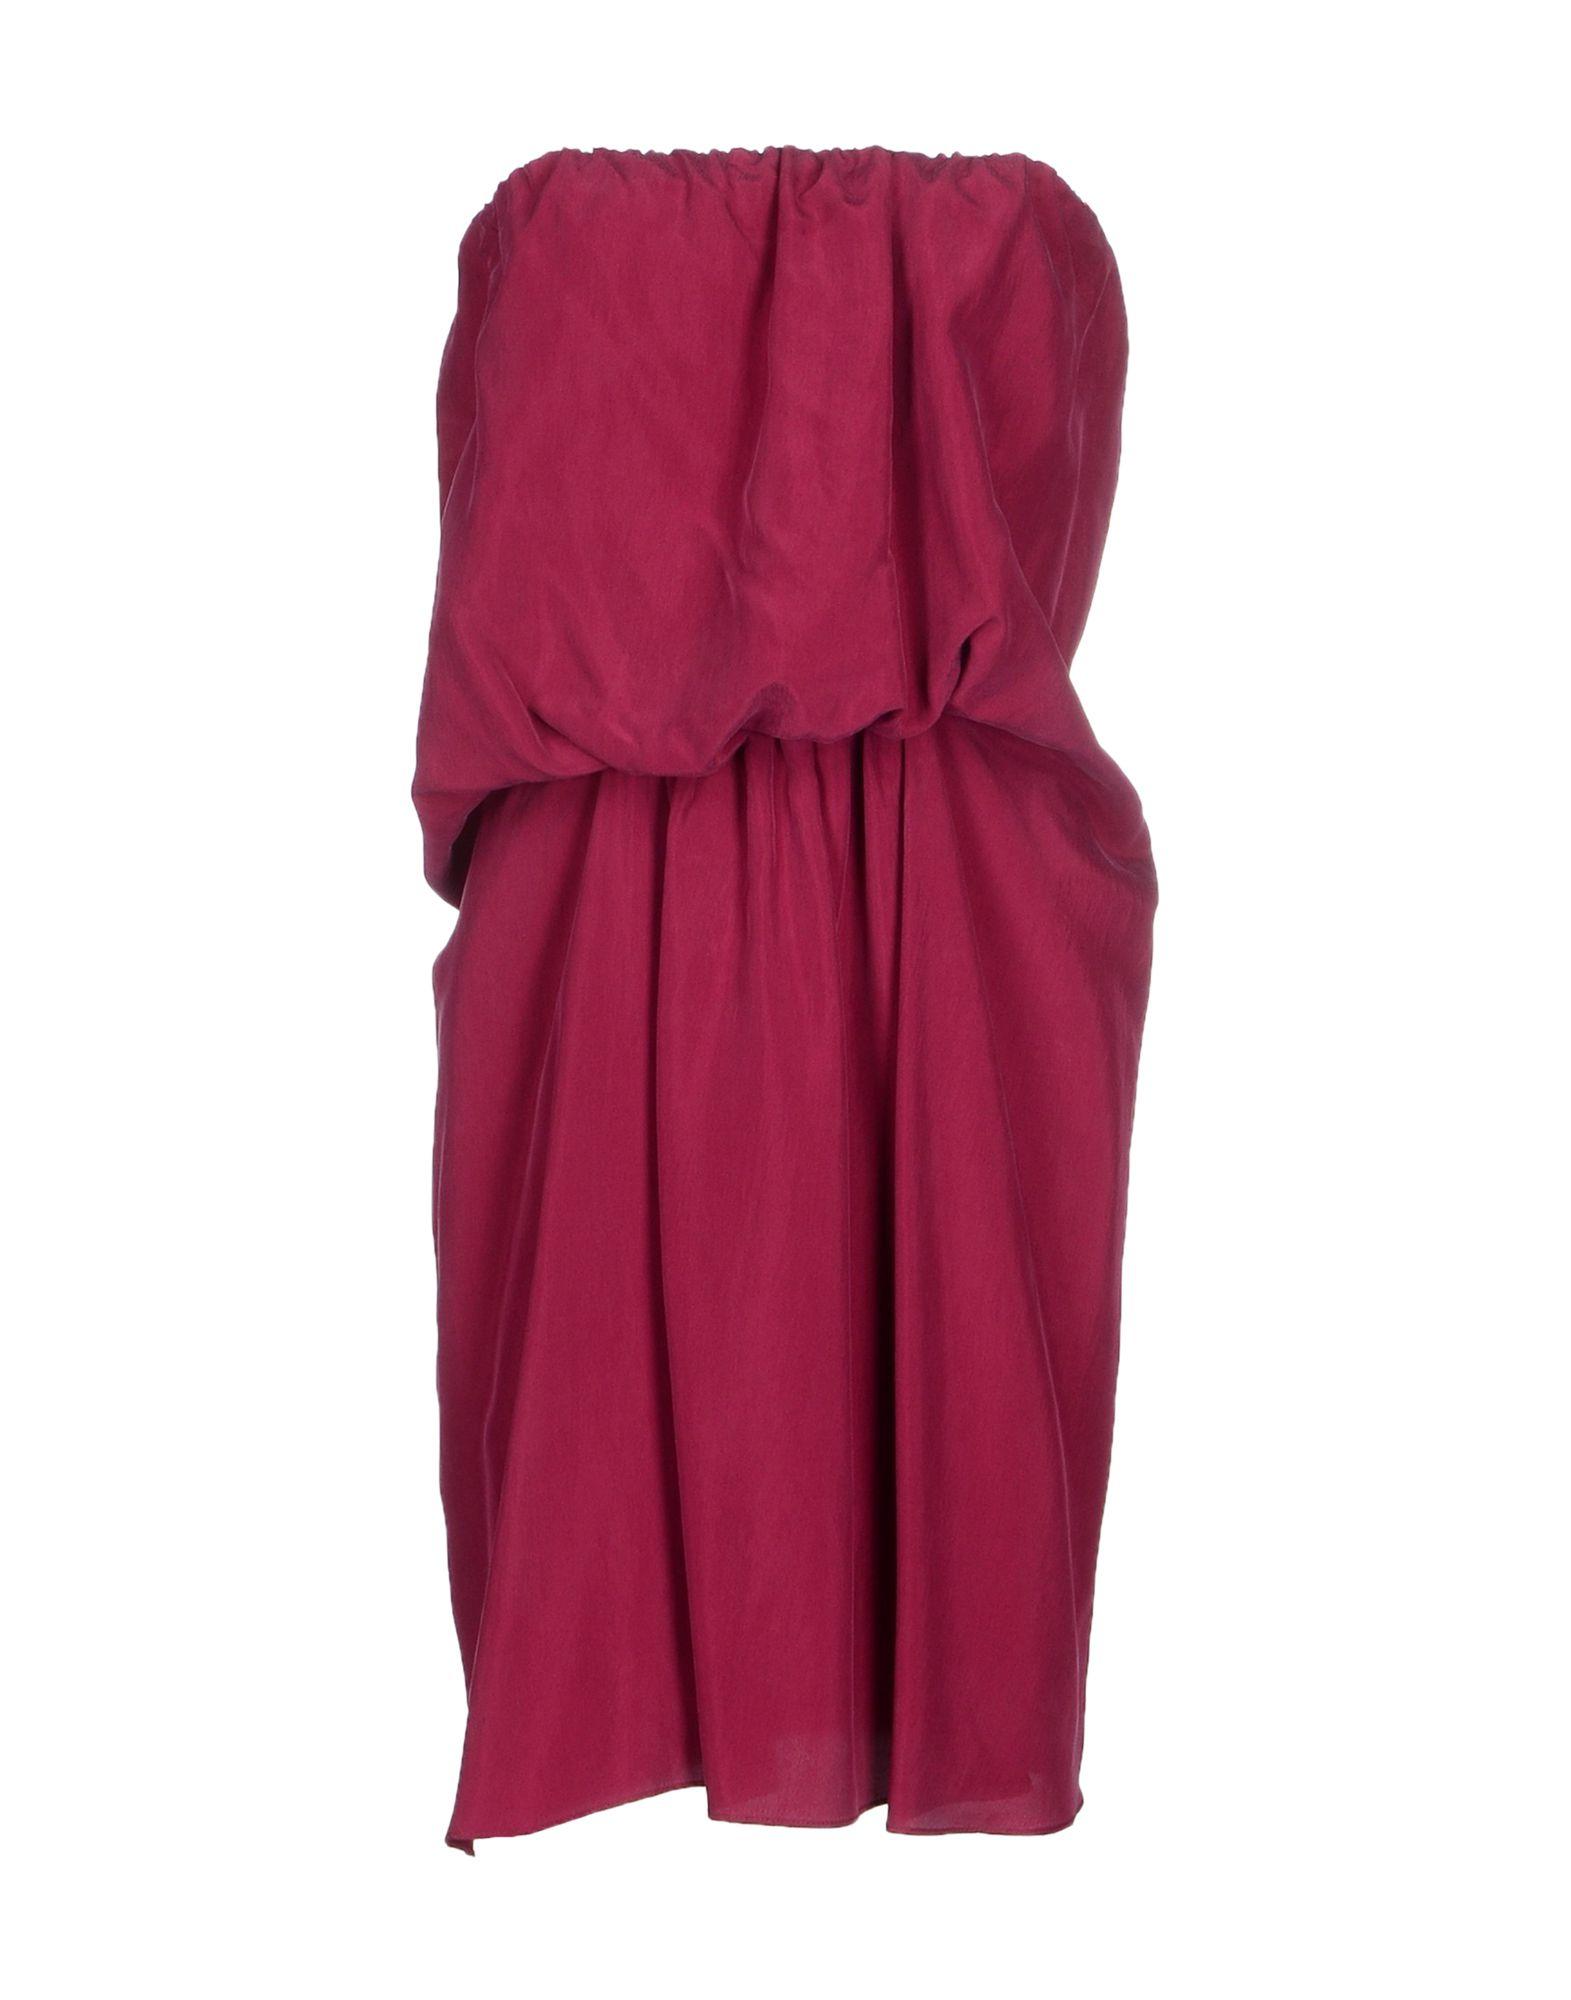 Space Style Concept Short Dress   Women Space Style Concept Short Dresses   34499323